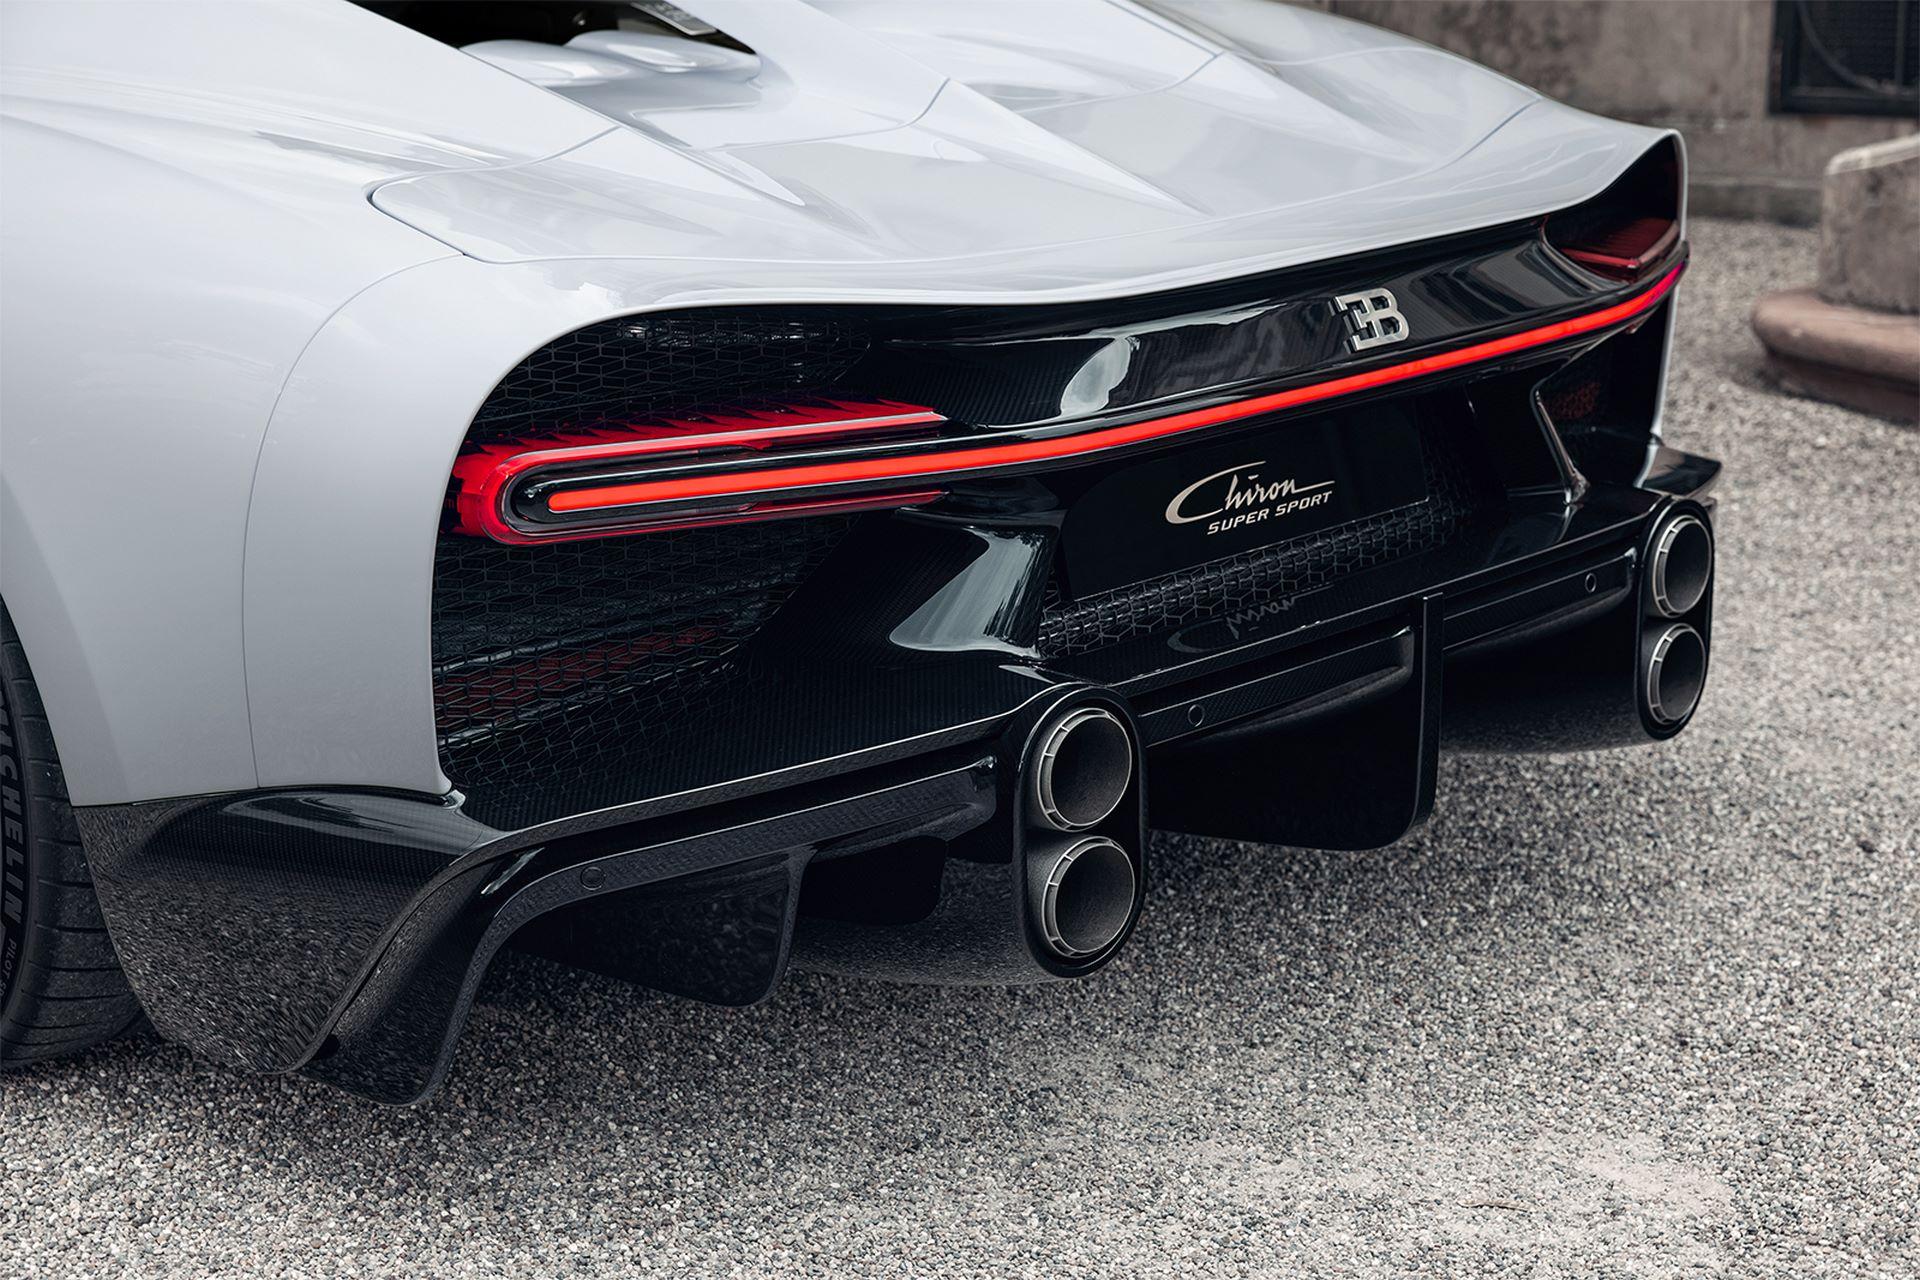 03-06_bugatti_chiron_super_sport_molsheim_rear_close-up